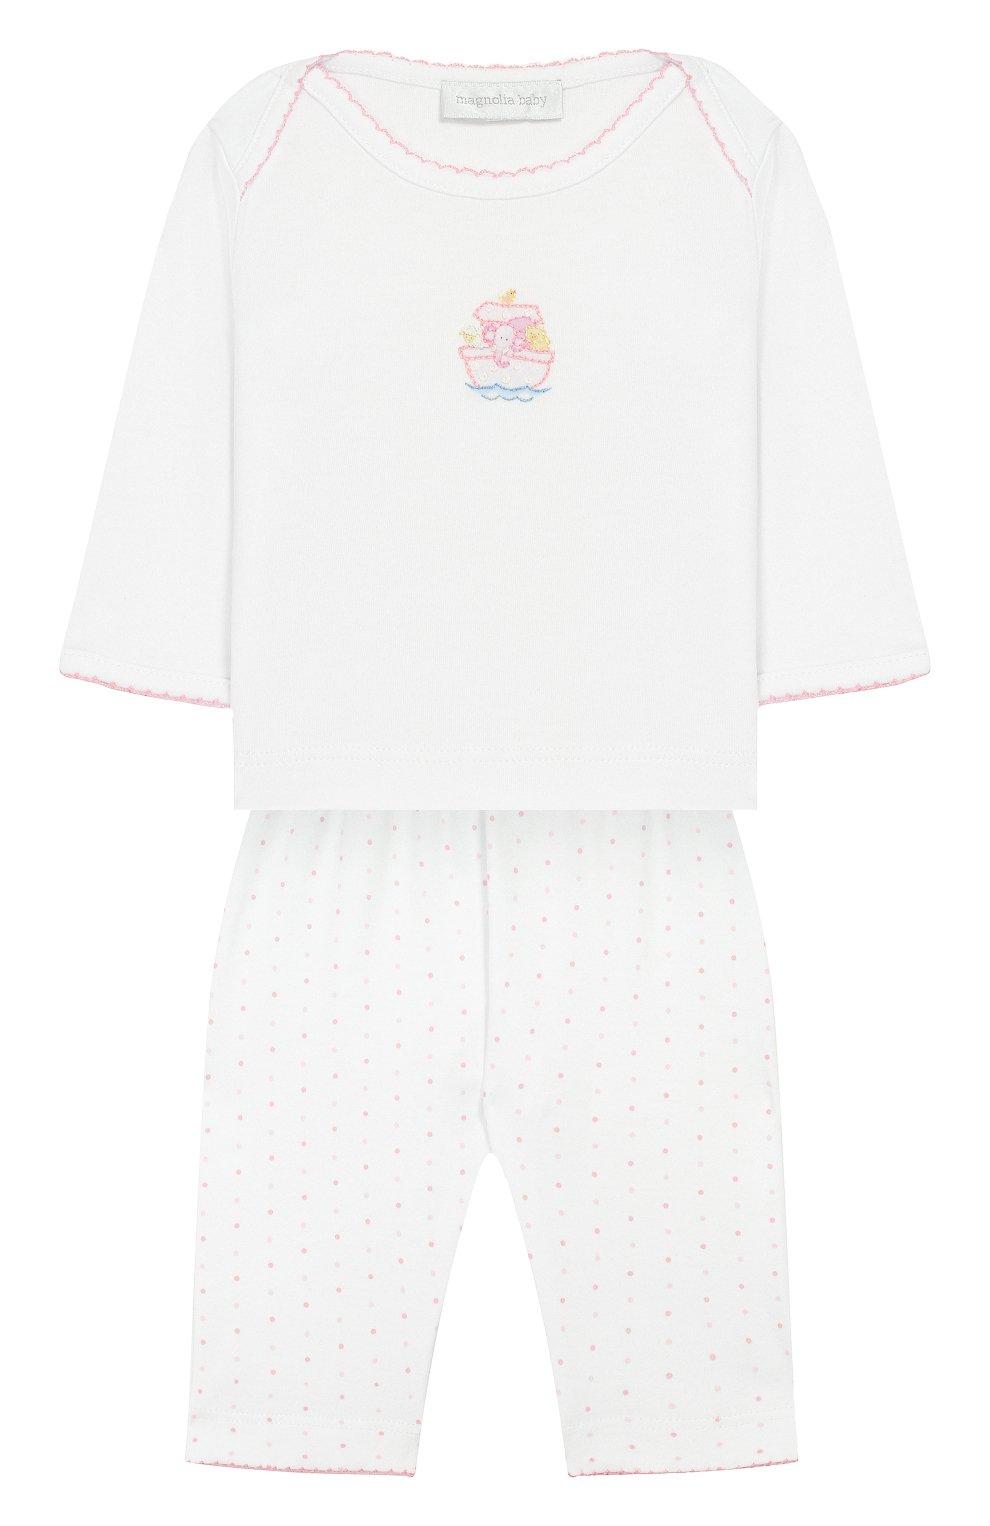 Детского комплект из лонгслива и брюк noah's friends MAGNOLIA BABY розового цвета, арт. E109-27-PK   Фото 1